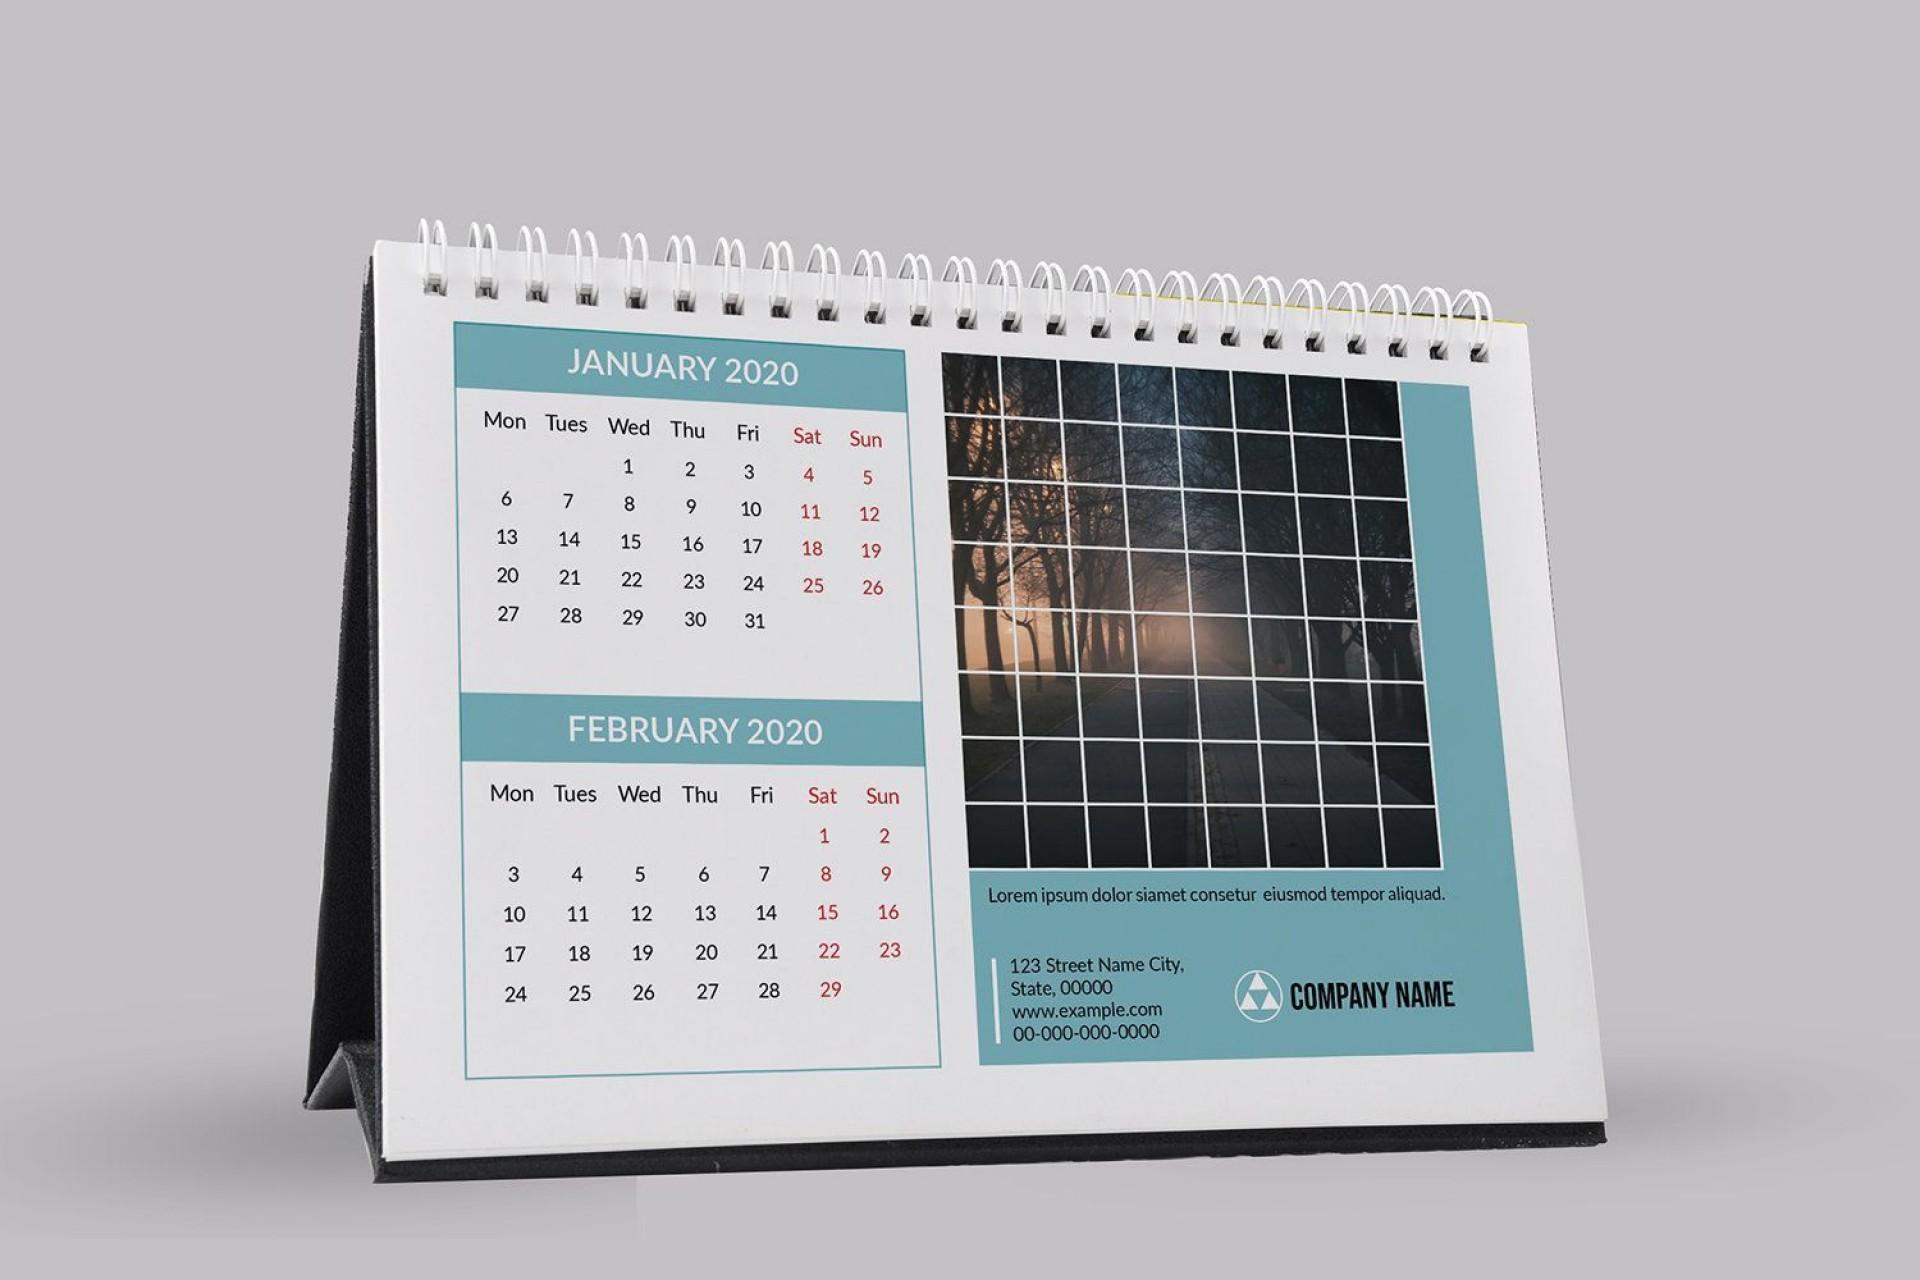 001 Wondrou 2020 Calendar Template Indesign Highest Clarity  Adobe Free1920